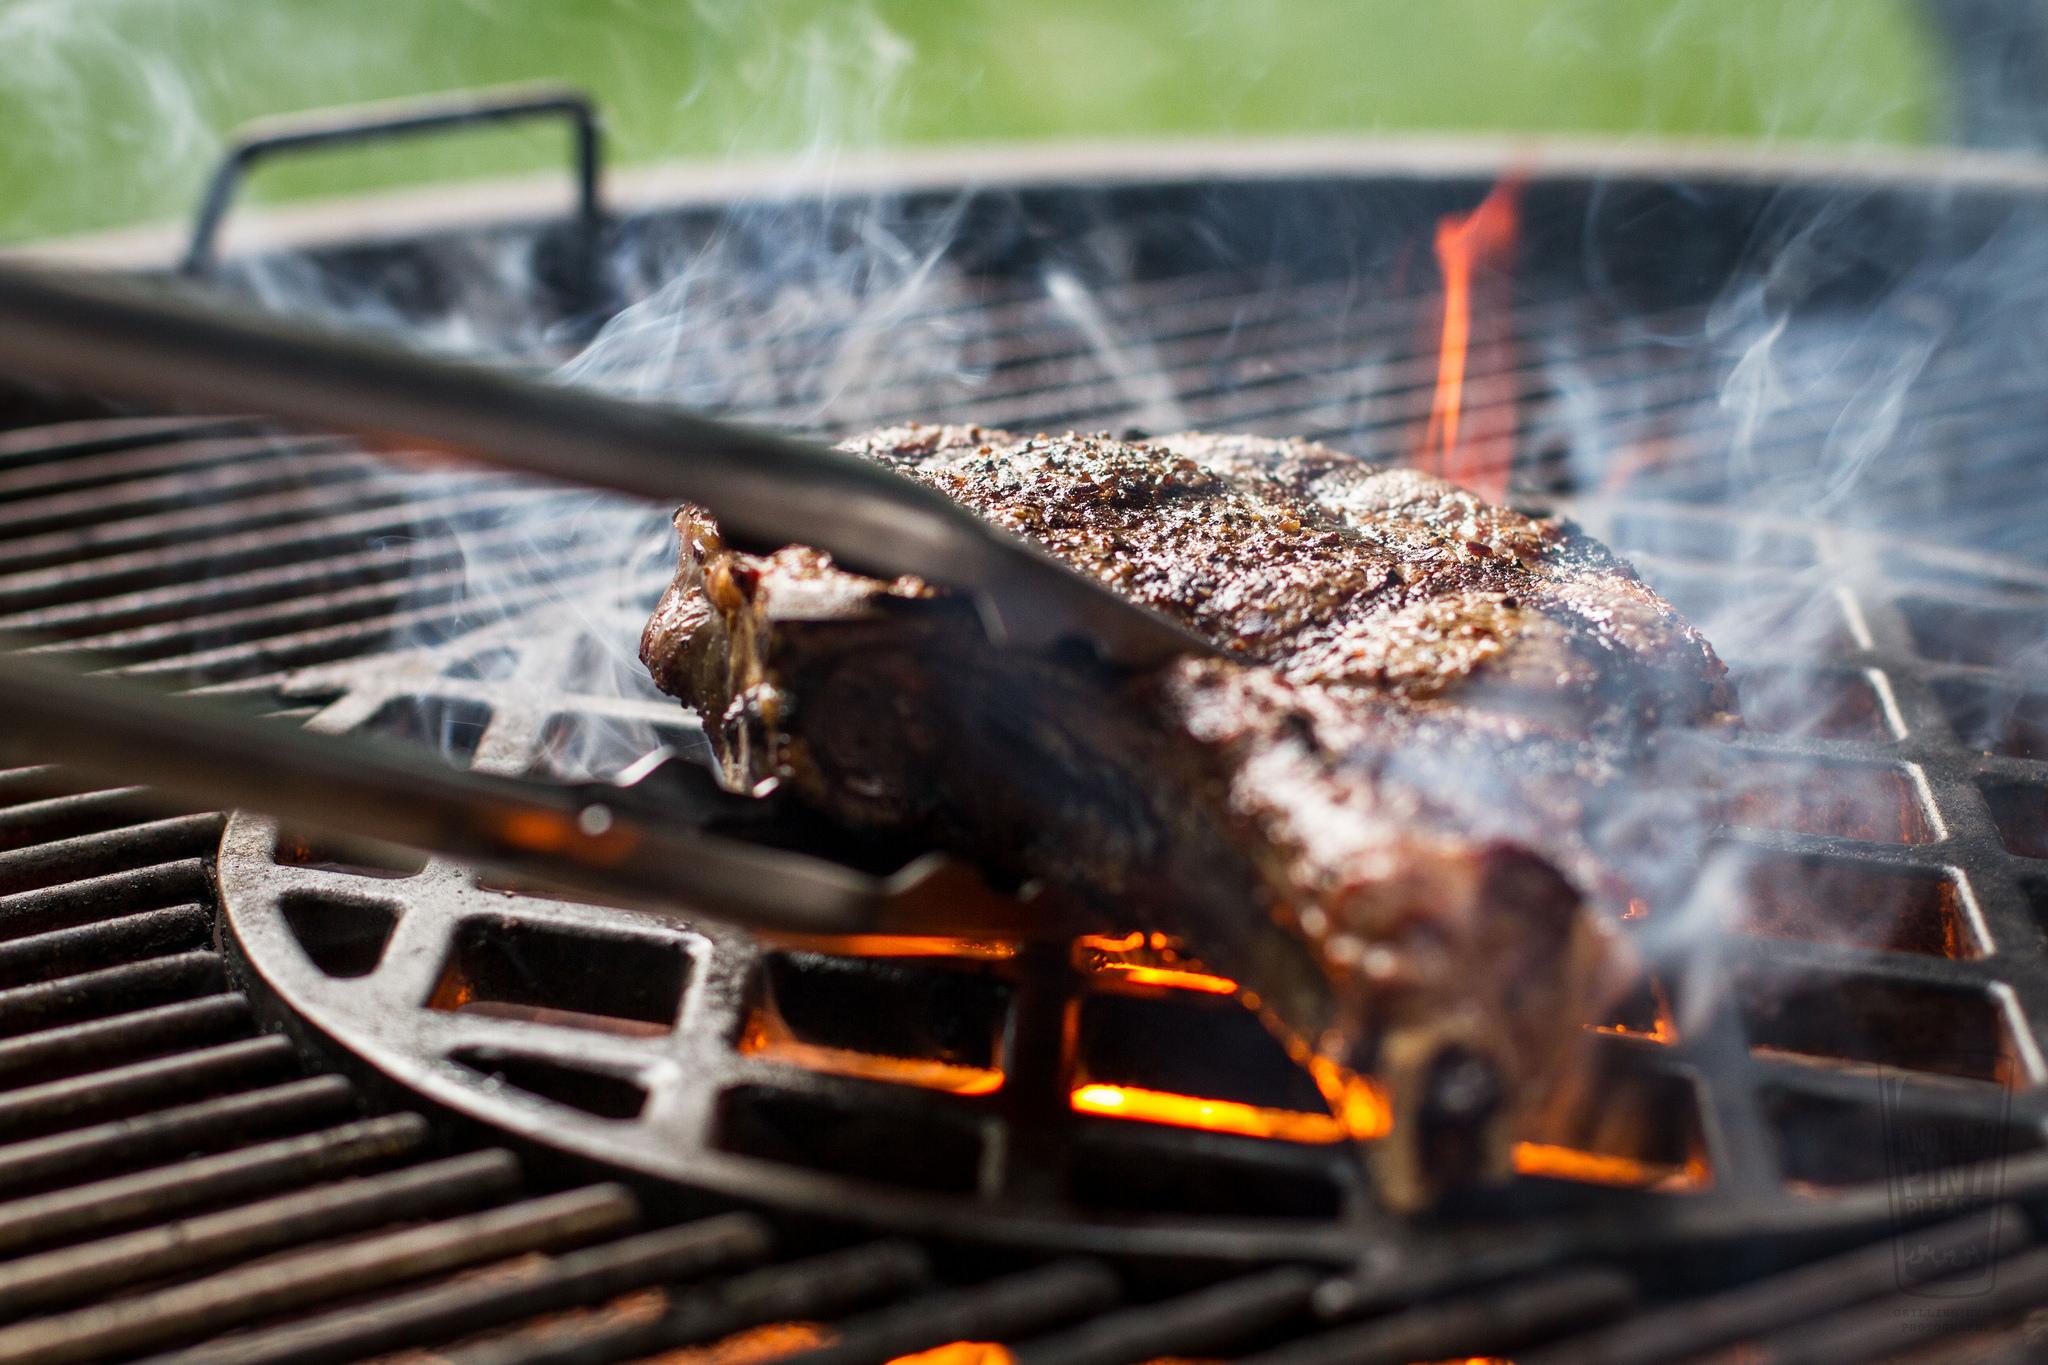 Grilled Steak on Weber Grill.jpg